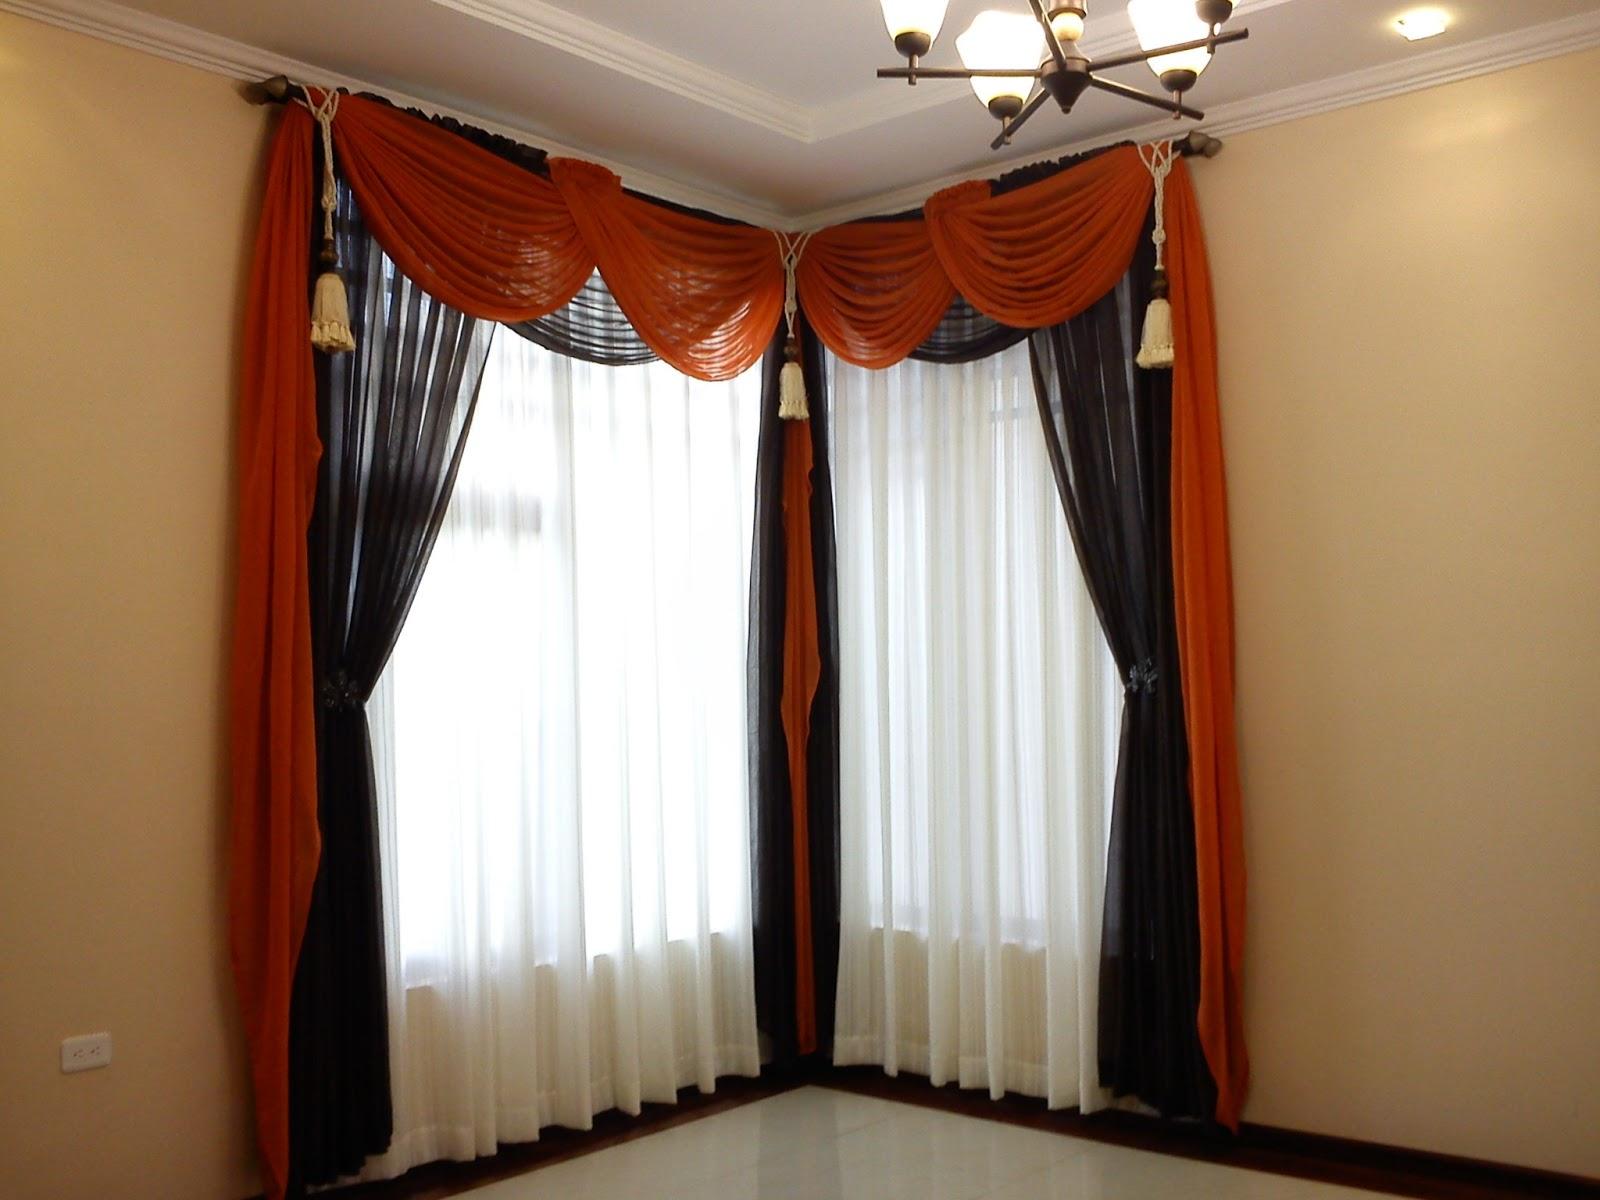 Cortinova cat logo de cortinas para reas sociales for Catalogo de cortinas para sala